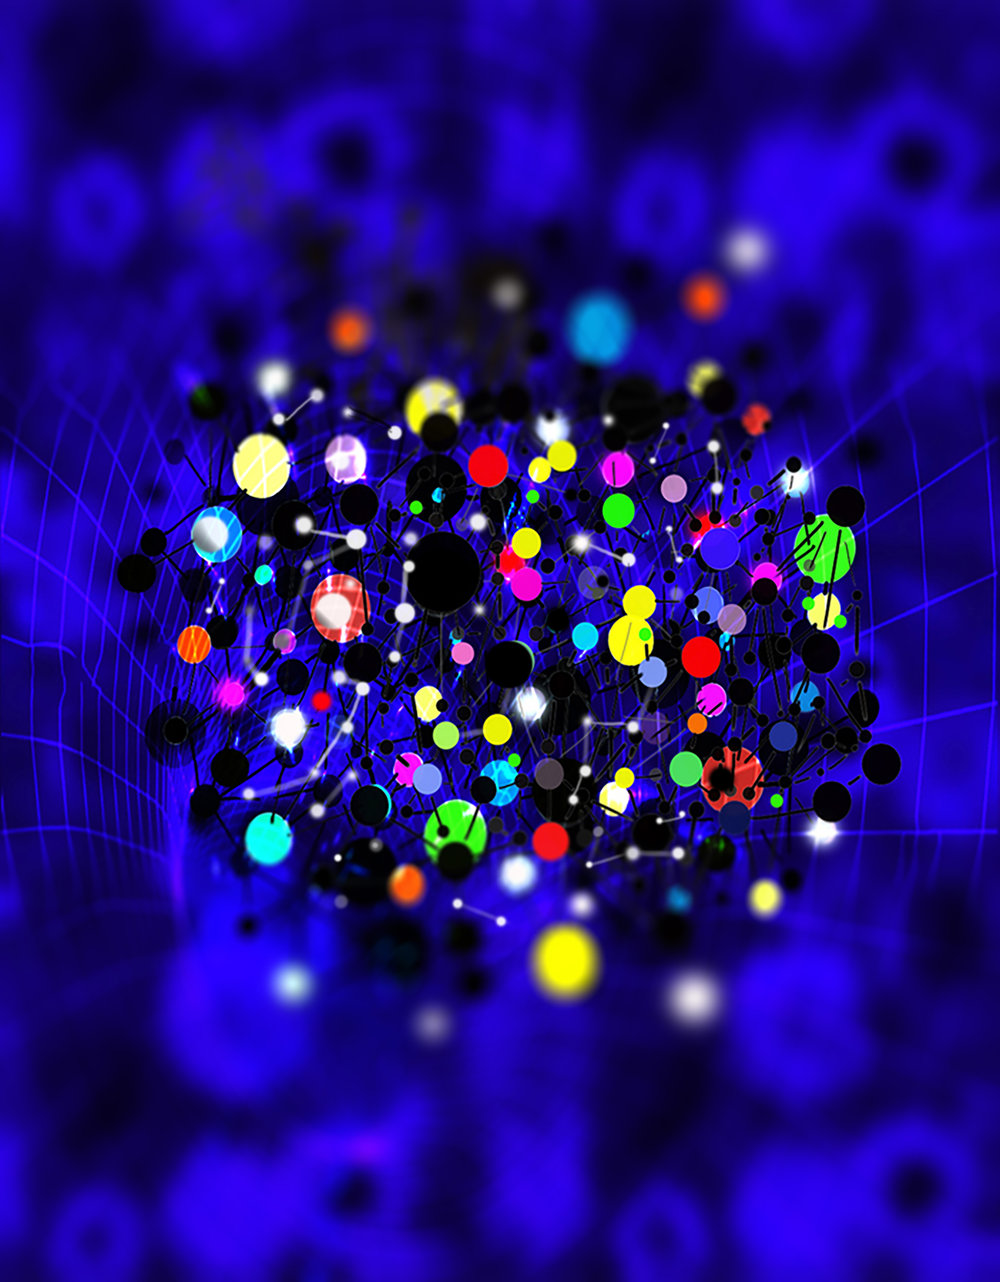 01 Blue Molecular KW.jpg